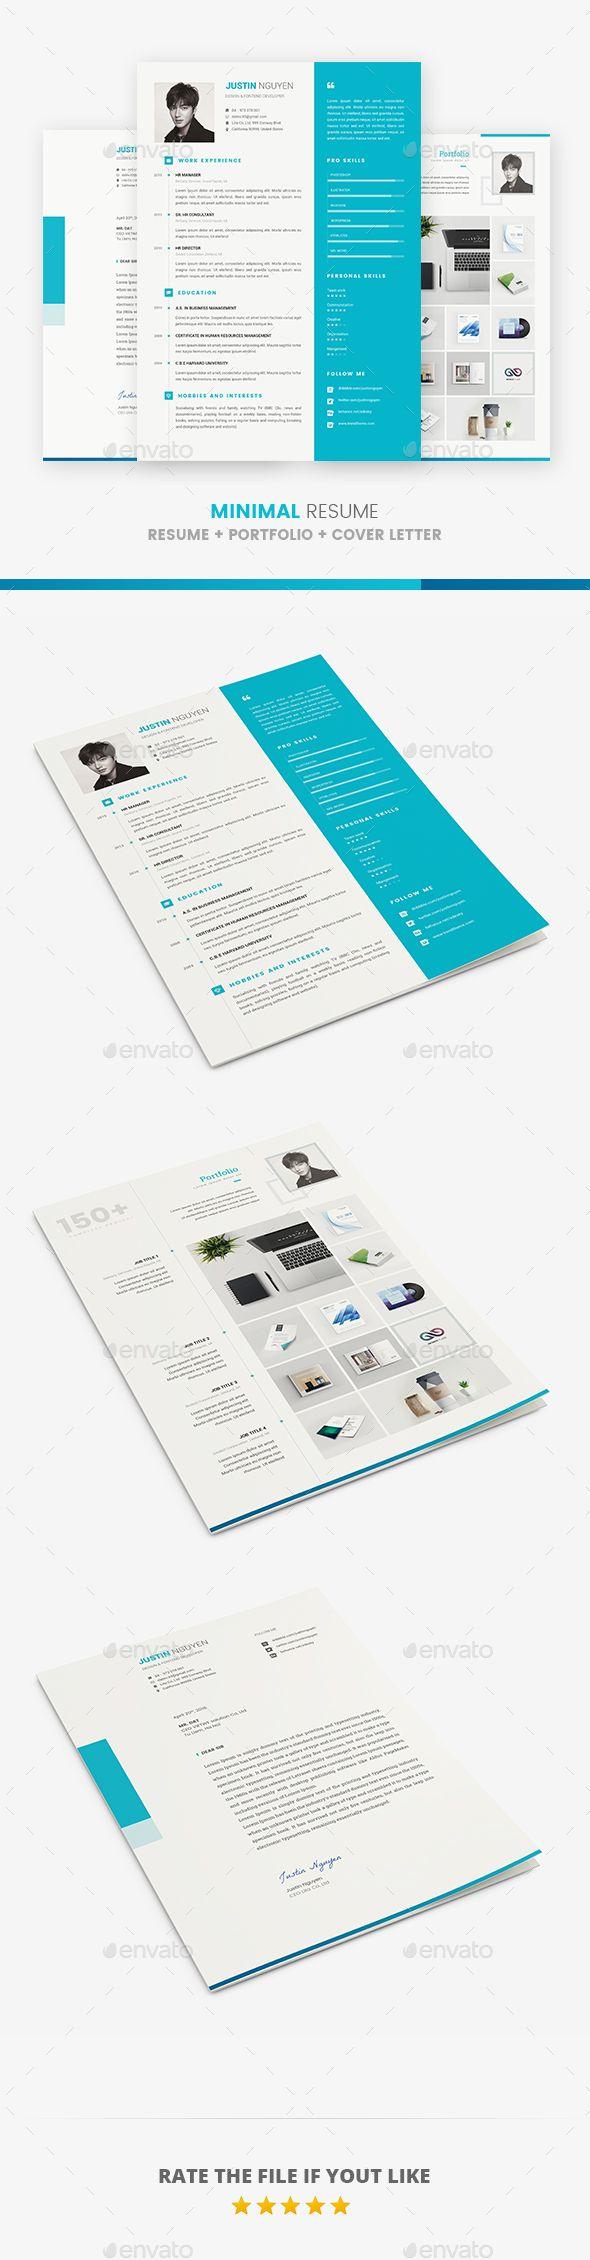 37 best Premium Resume Packages images on Pinterest | Design resume ...